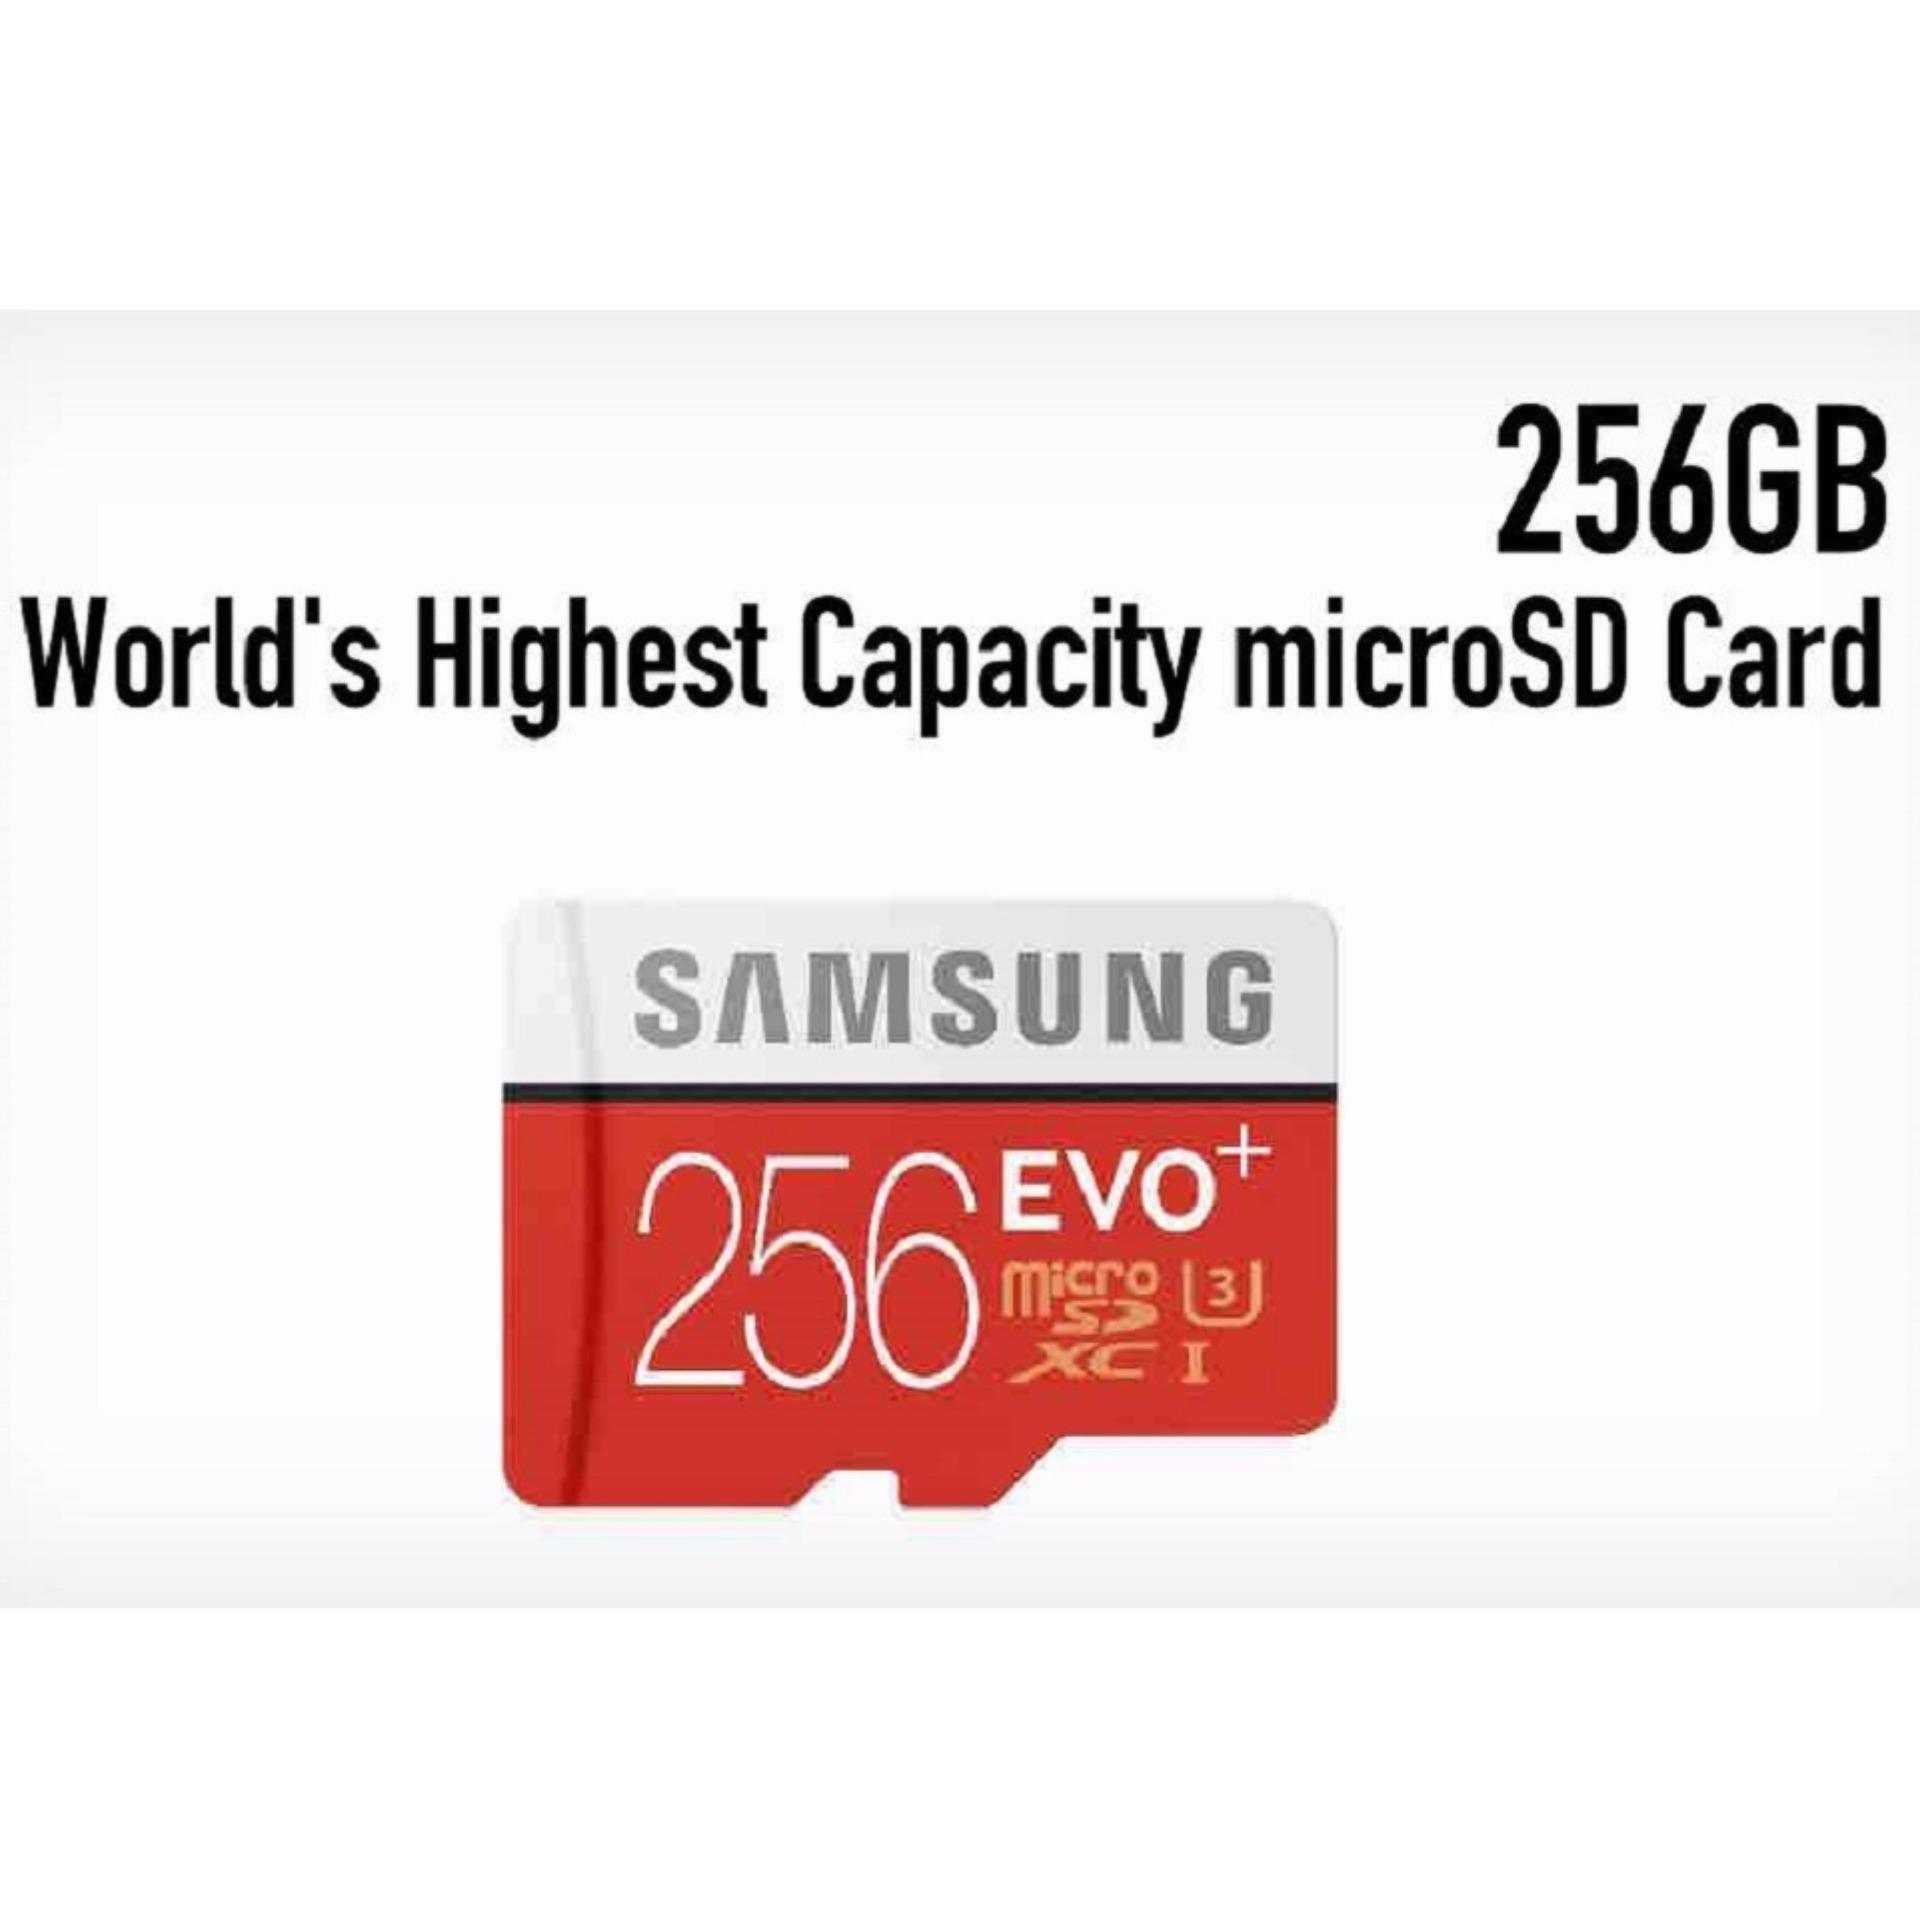 Samsung Memory Card MicroSDXC Evo Plus 256GB / 95MB/s with Adapter - Merah ...